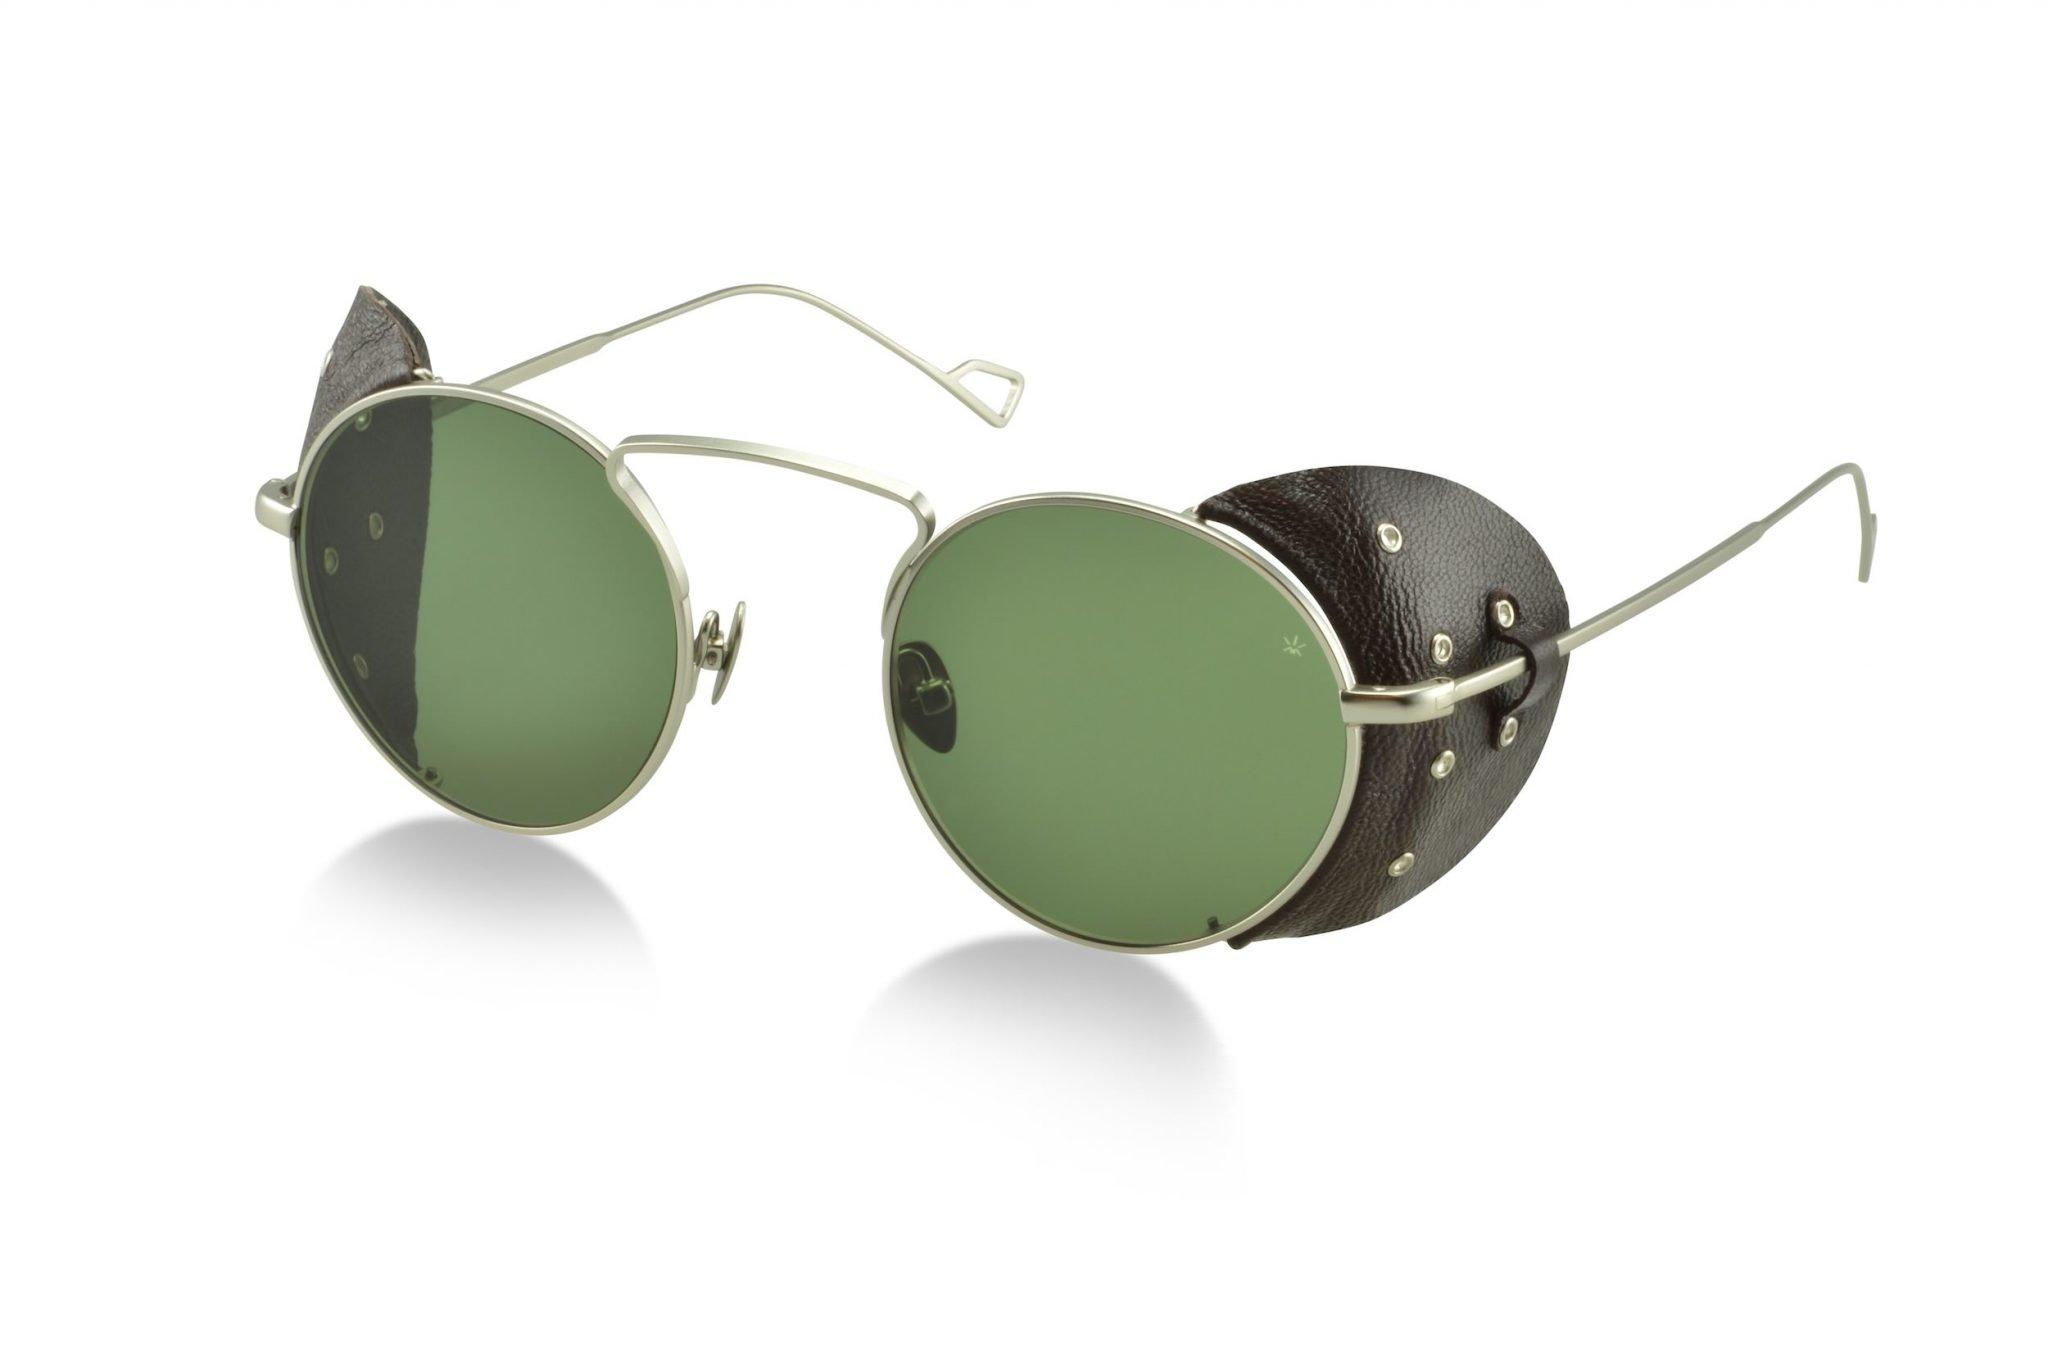 Northern Lights Optic NL 18 Sunglasses - Northern Lights Optic Alpine Noir Sunglasses